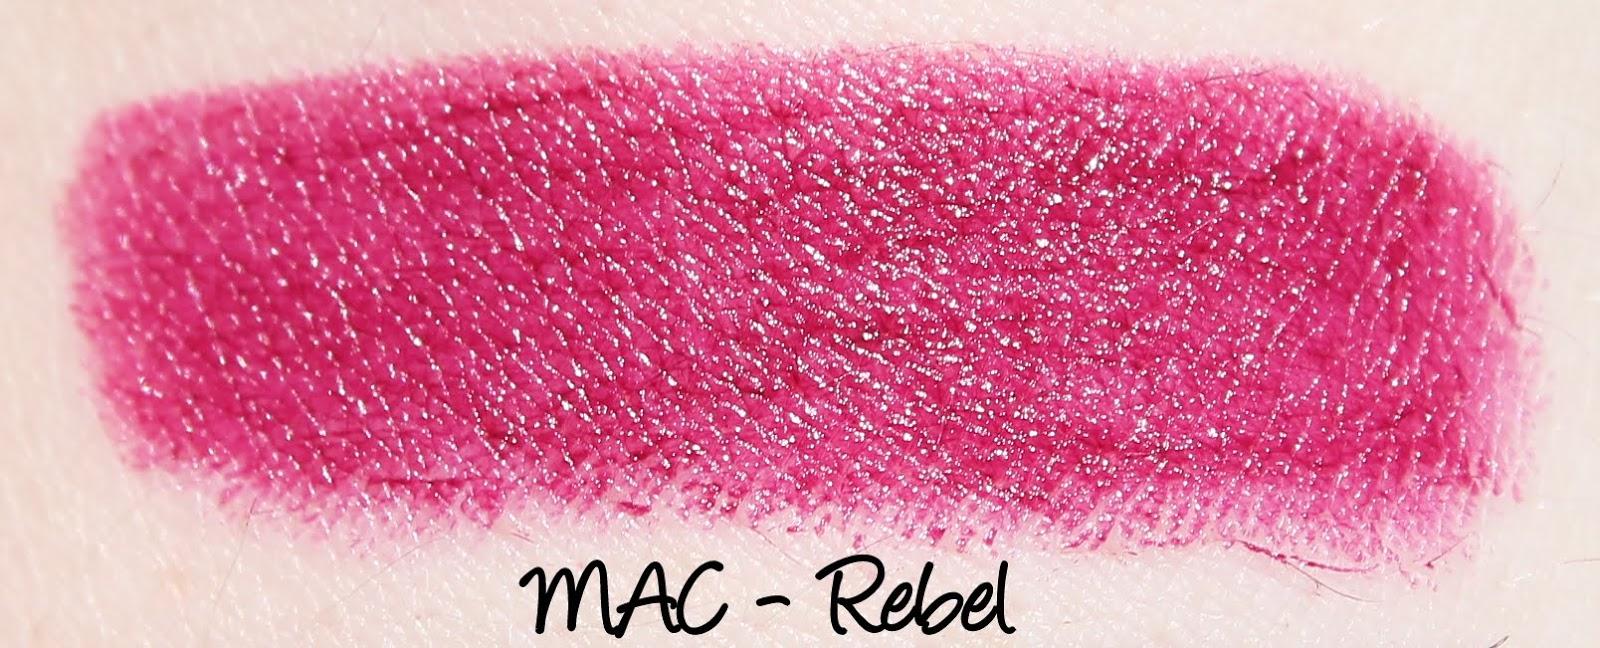 MAC Heirloom Mix Lipsticks - Rebel Swatches & Review